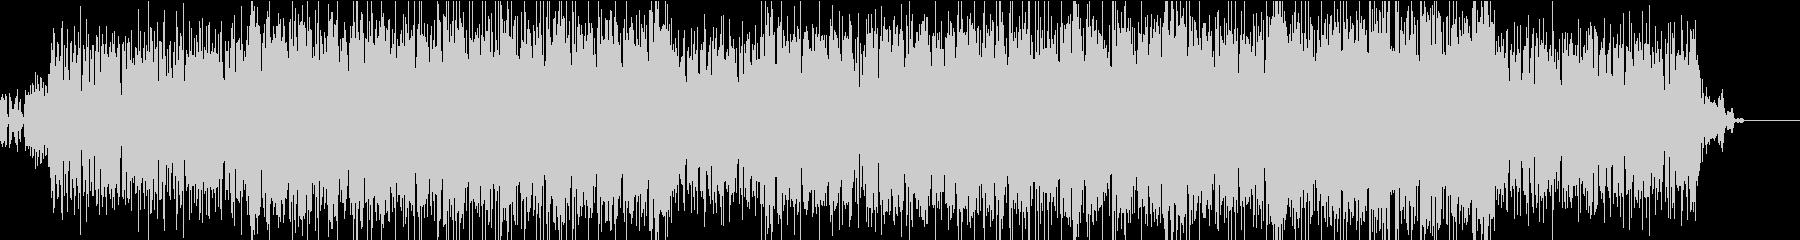 House / Dance Rock's unreproduced waveform